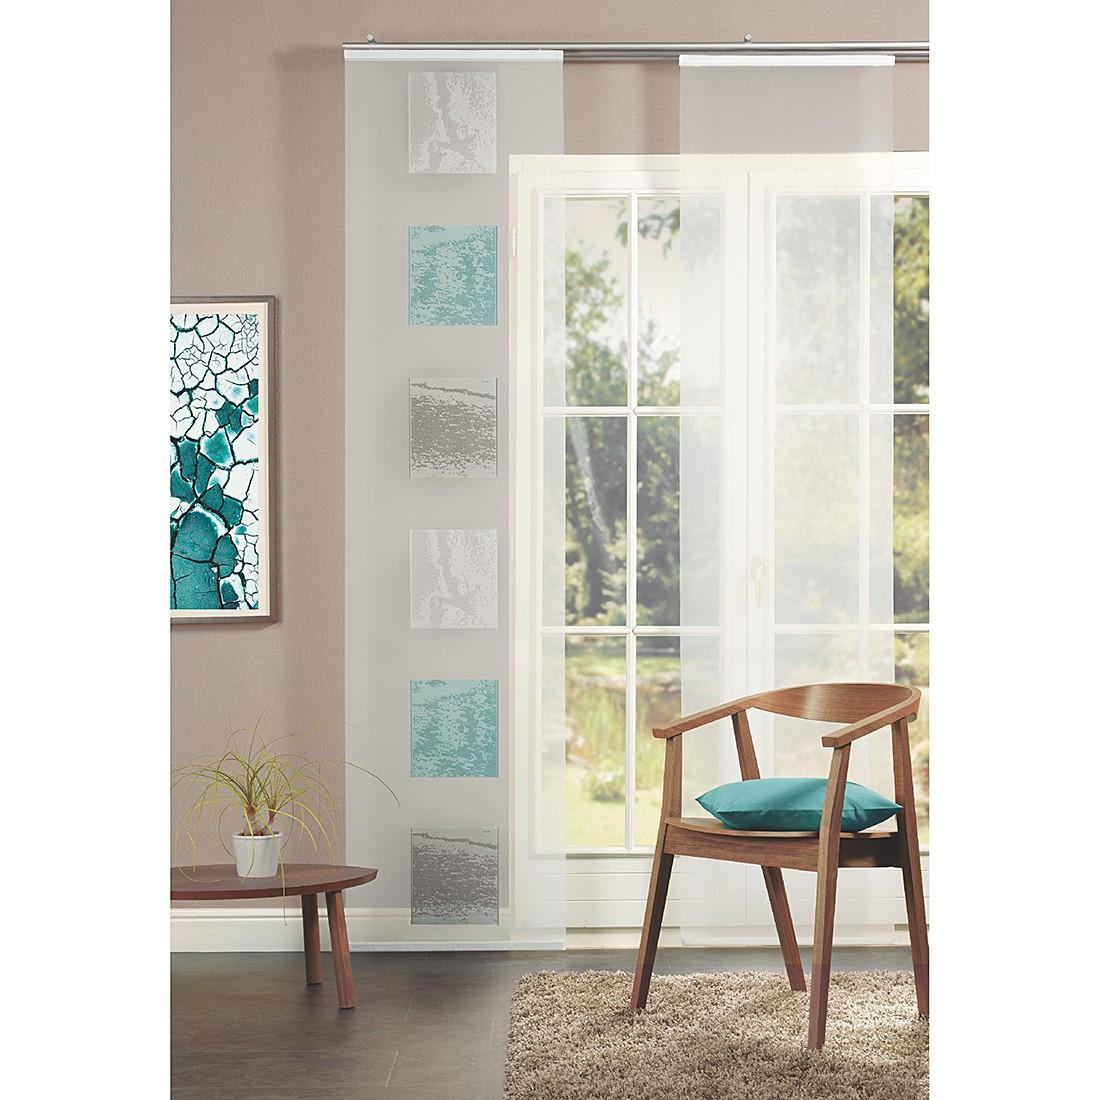 schiebevorh nge petrol sonstige preisvergleiche. Black Bedroom Furniture Sets. Home Design Ideas